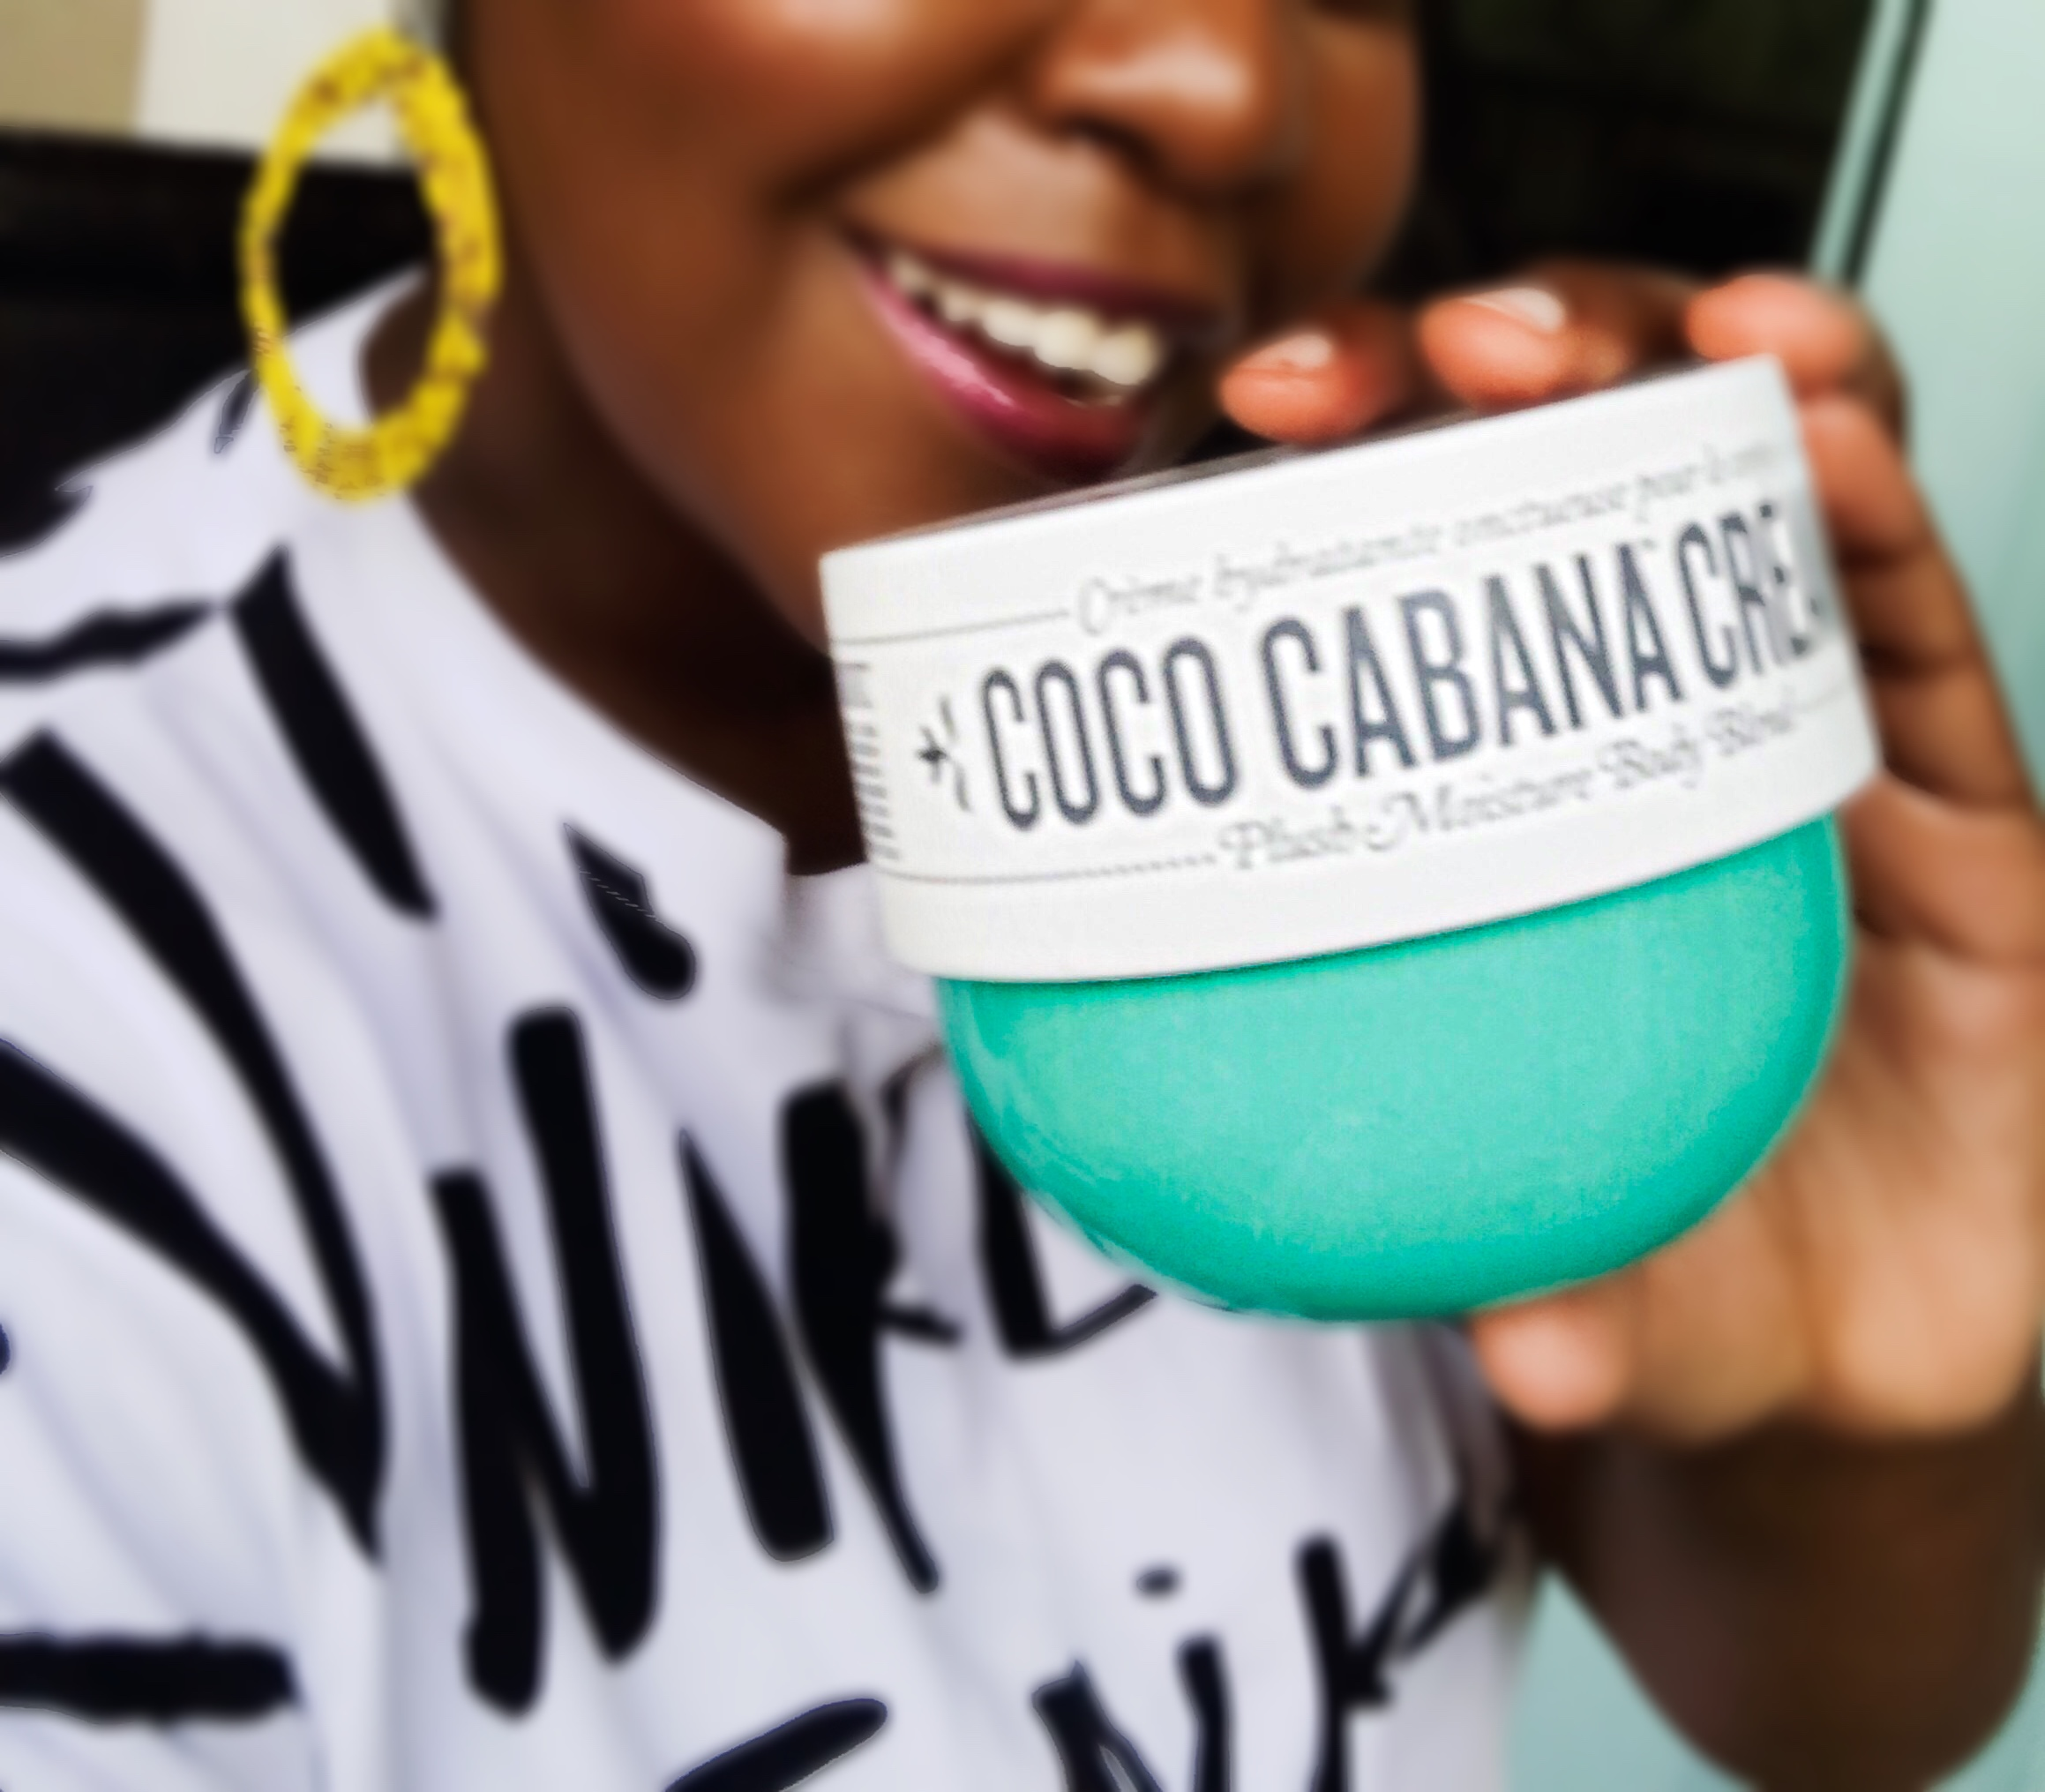 dark skin beauty blogger, sephora vib rouge blogger, texas blogger, texas influencer, dark skin, best moisturizers for winter for black people, most hydrating moisturizers, HUDA BEAUTY, SEPHORa, SOL DE JANEIRO Coco Cabana Body Cream,